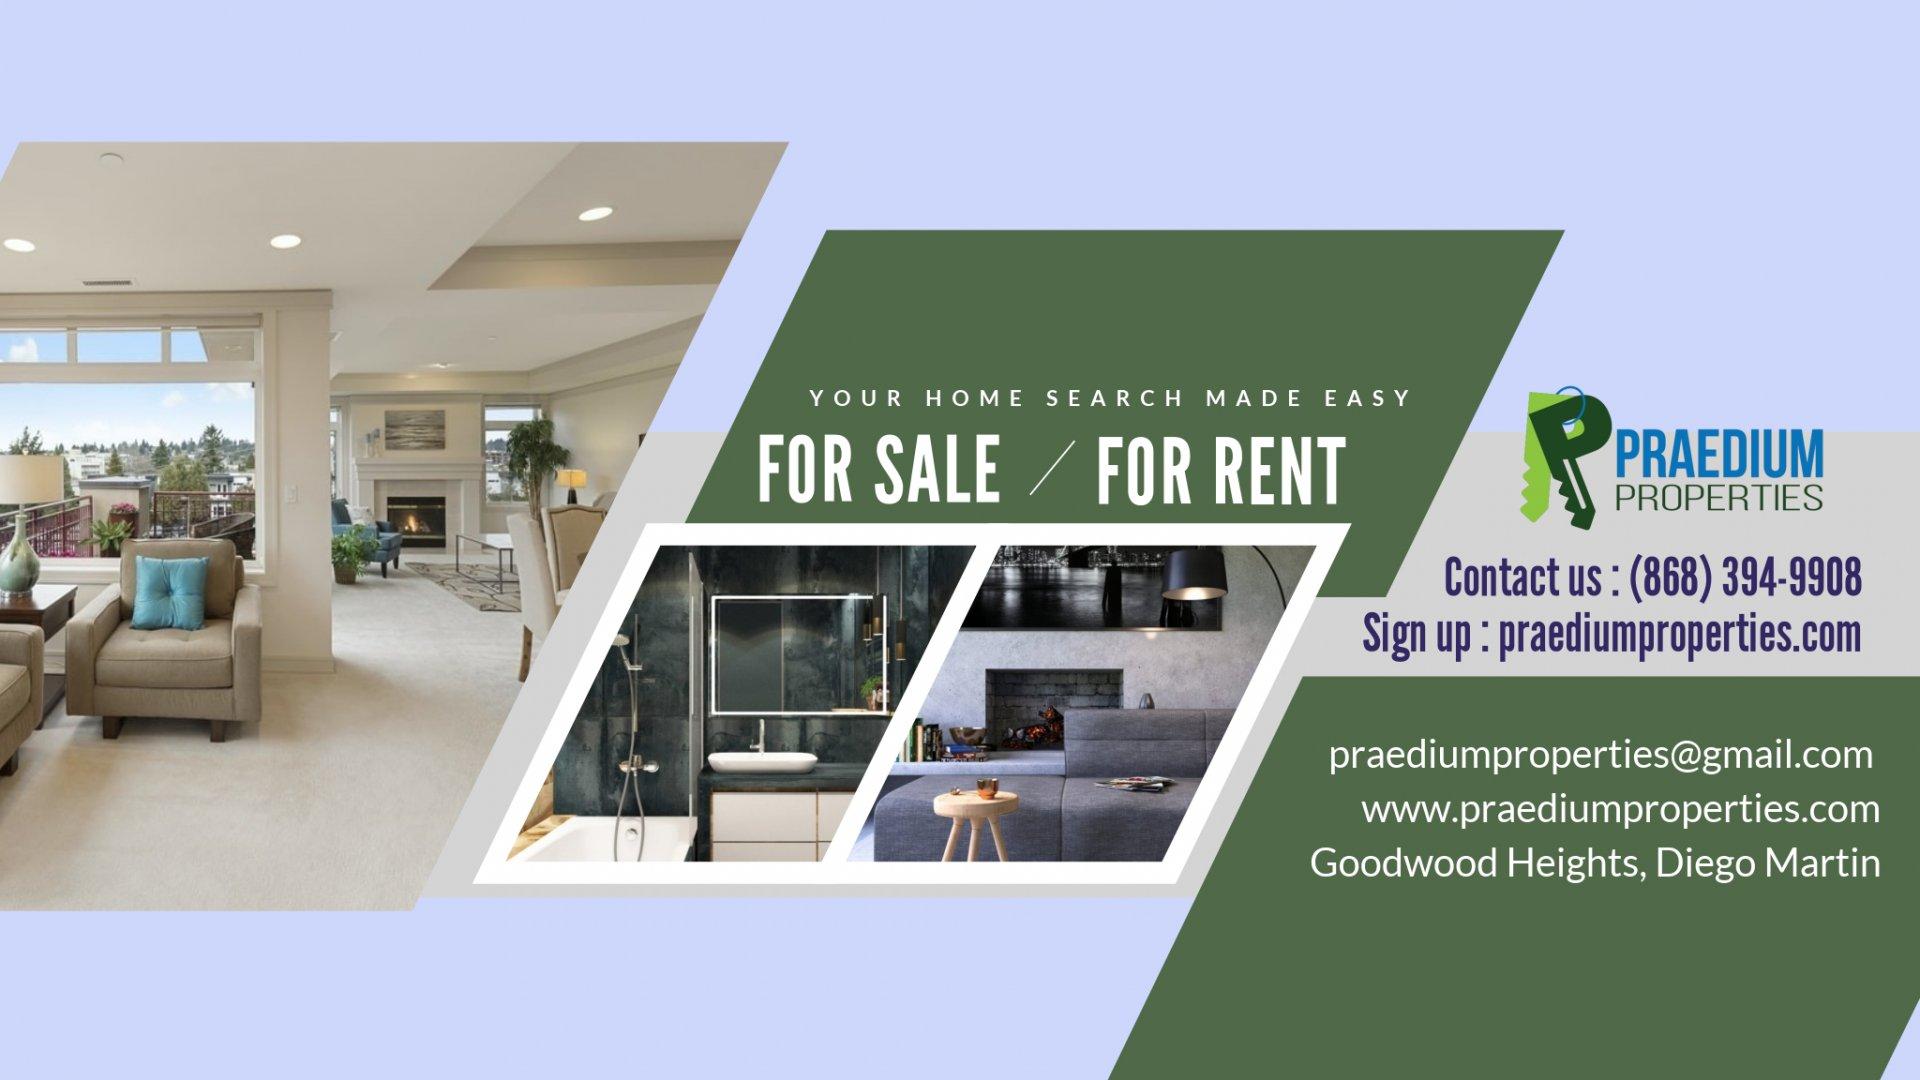 Praedium Properties Real Estate